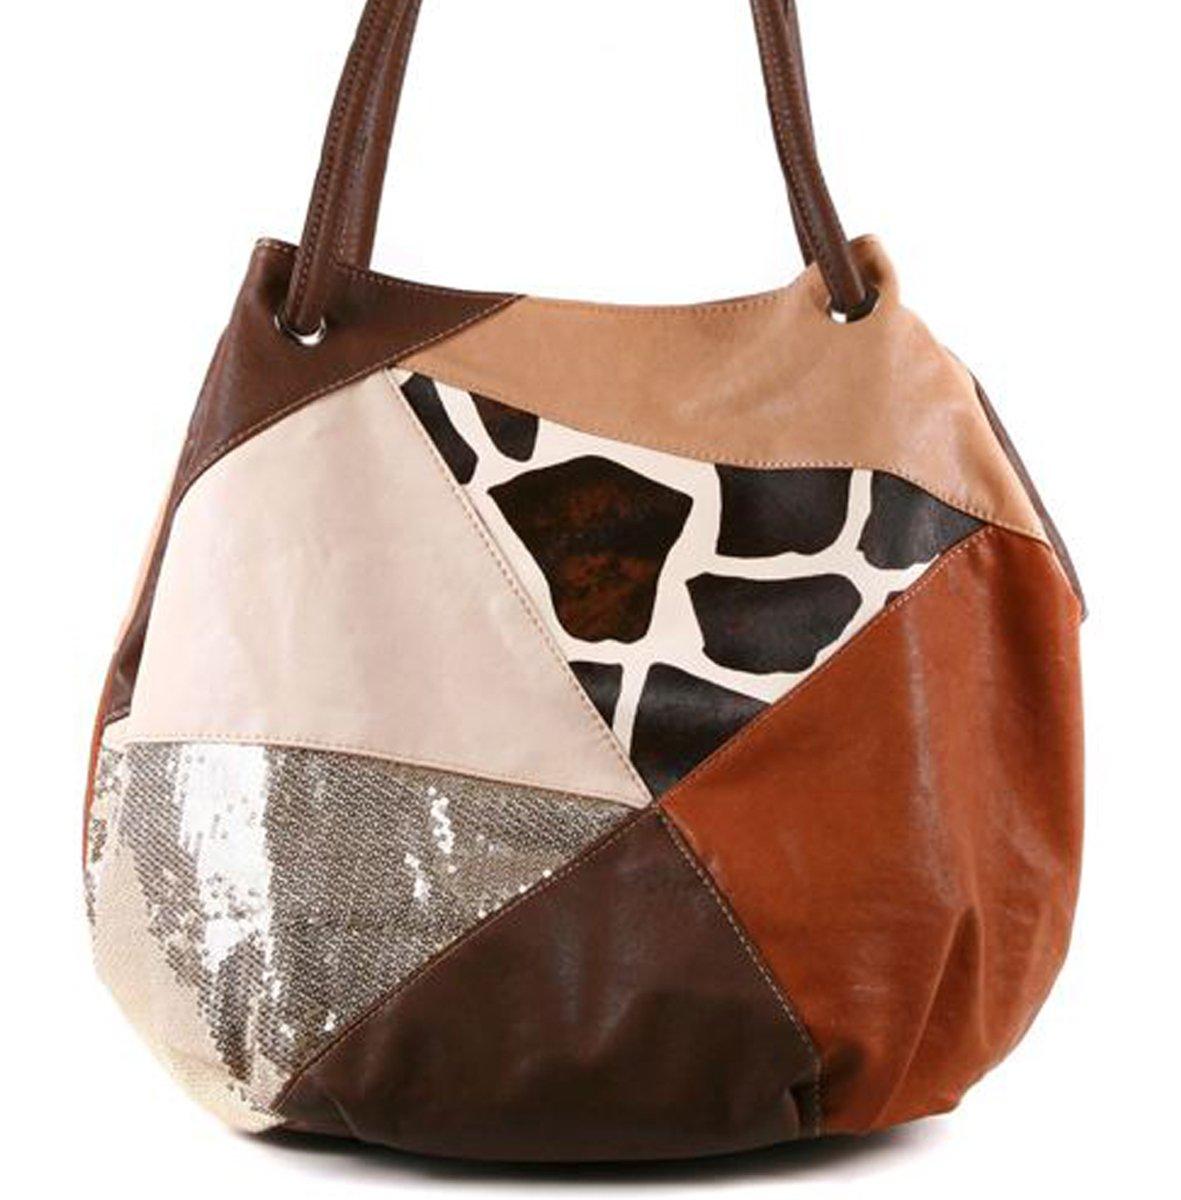 Safari Animal Print Rhinestones Sequins Studded Bag Purse~Leopard Giraffe Cow~